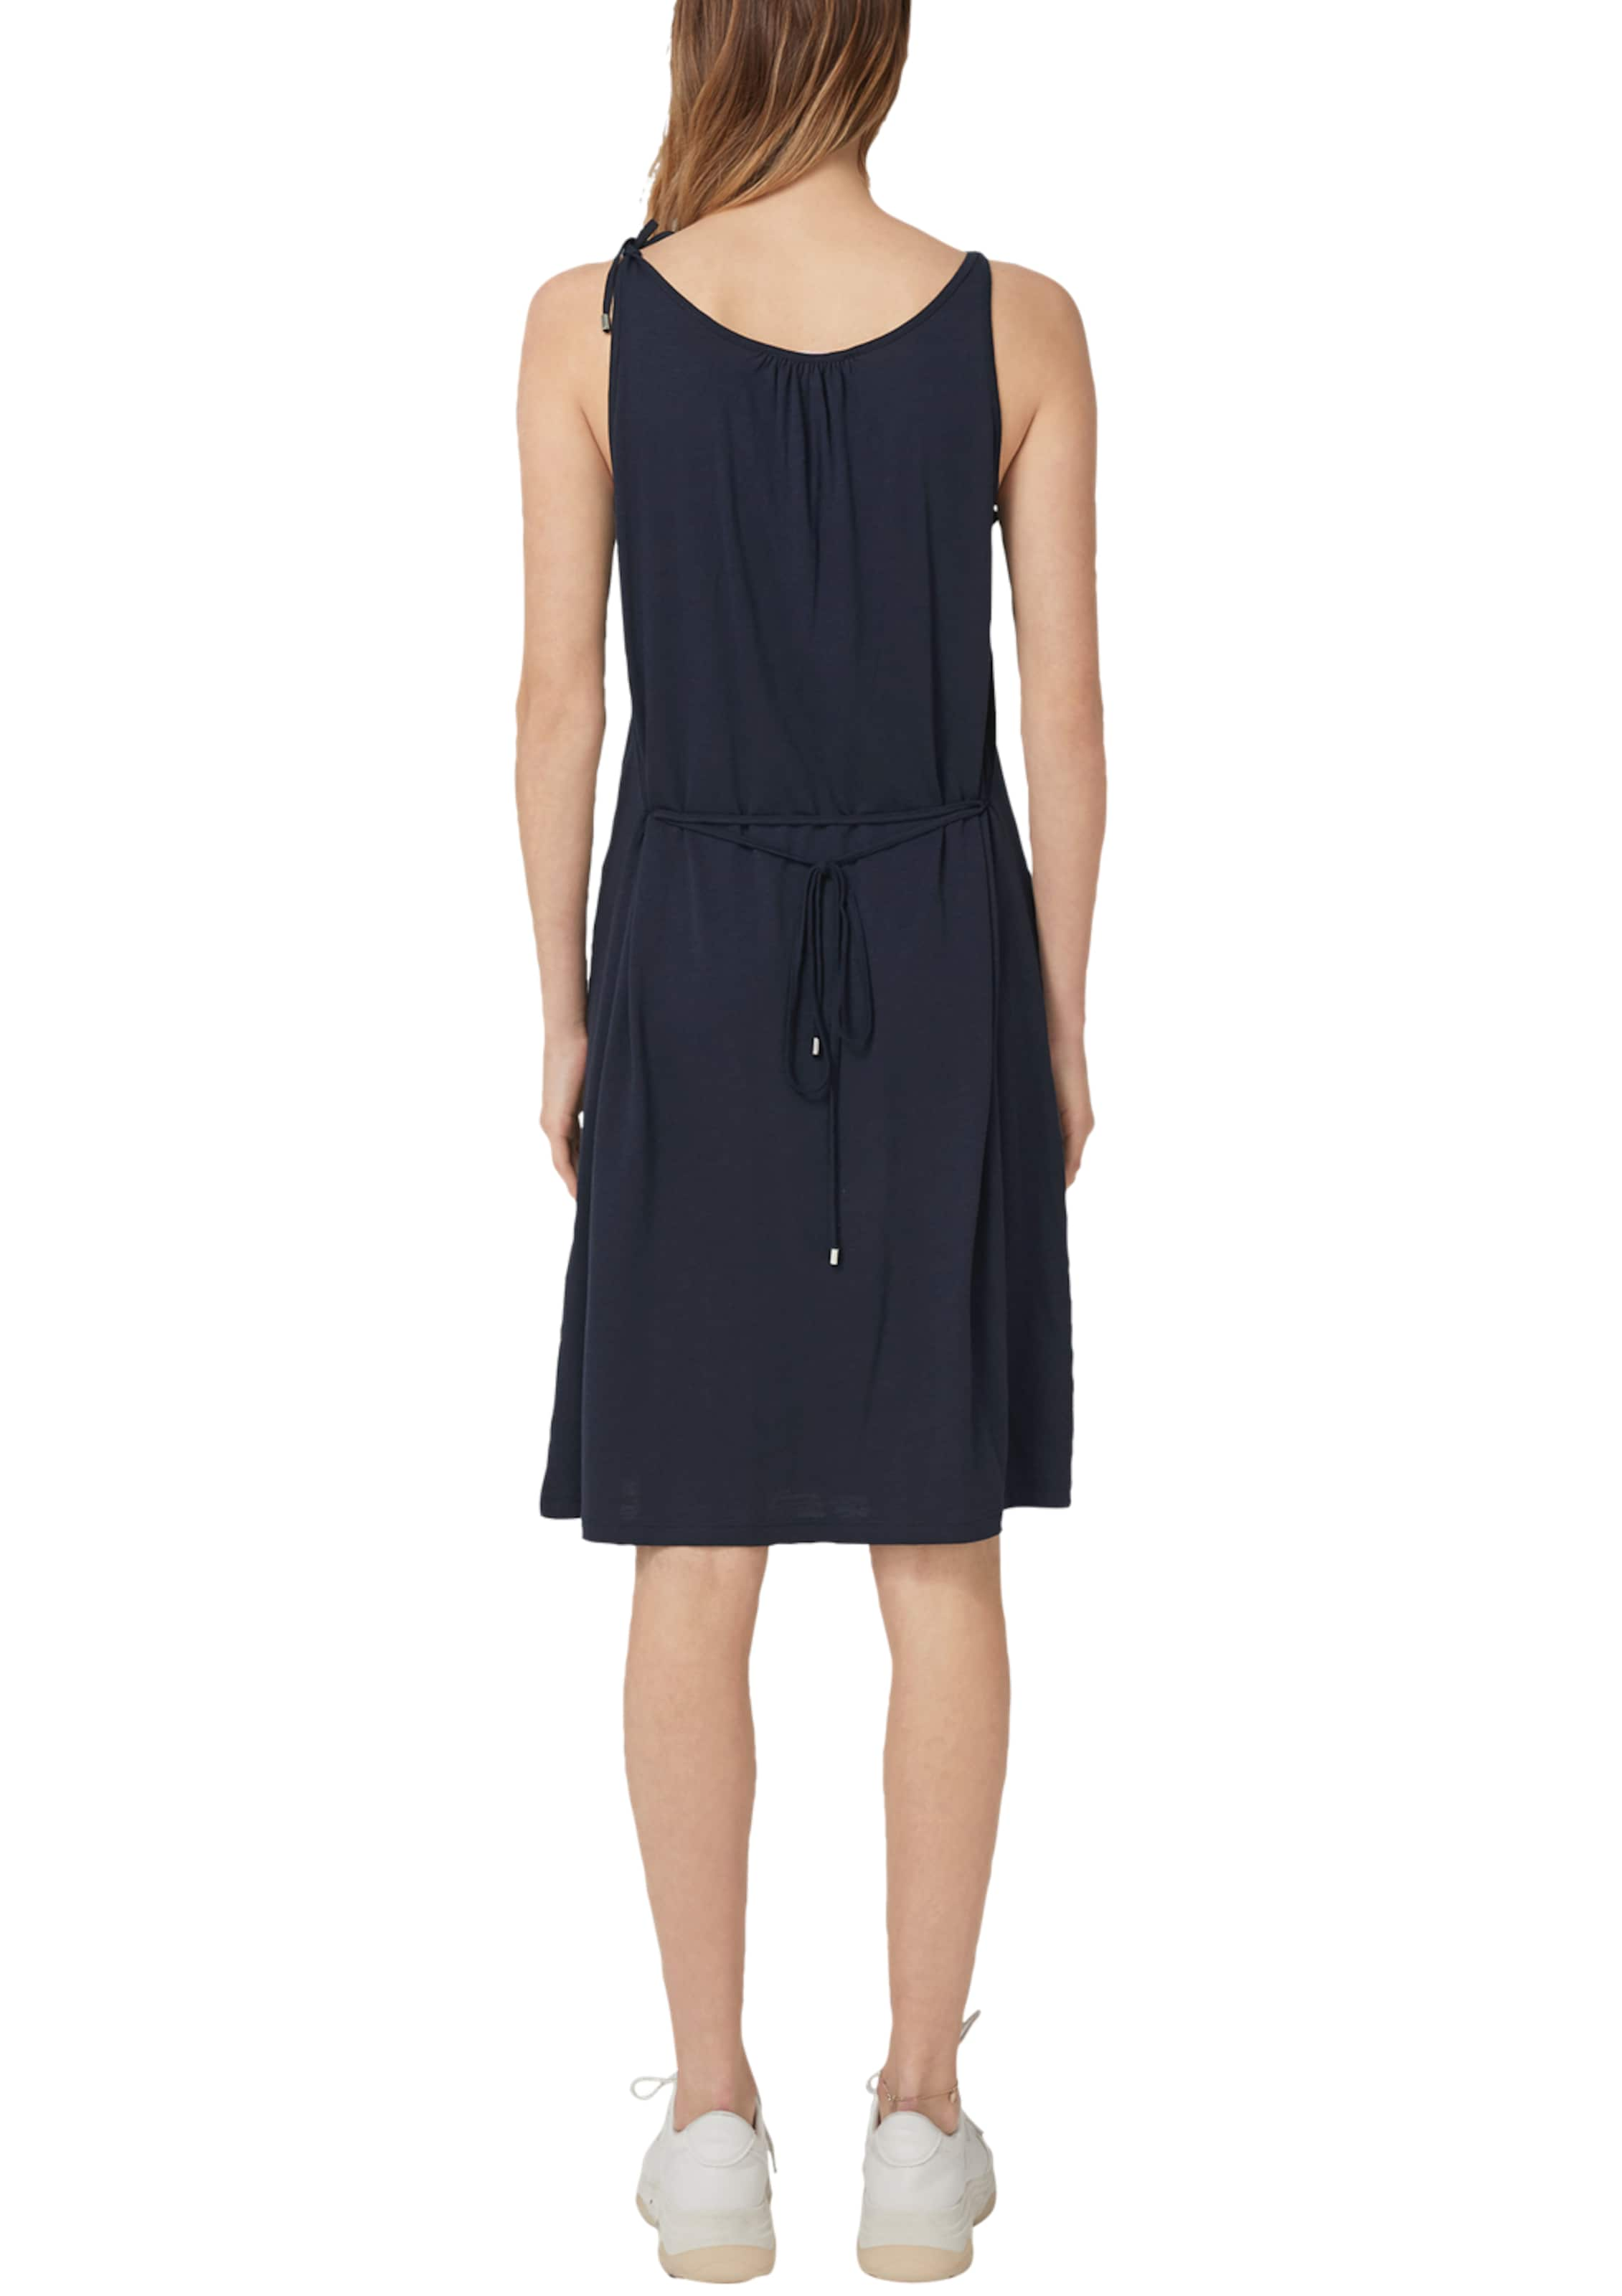 Kleid Nachtblau In S S oliver DHE2I9W